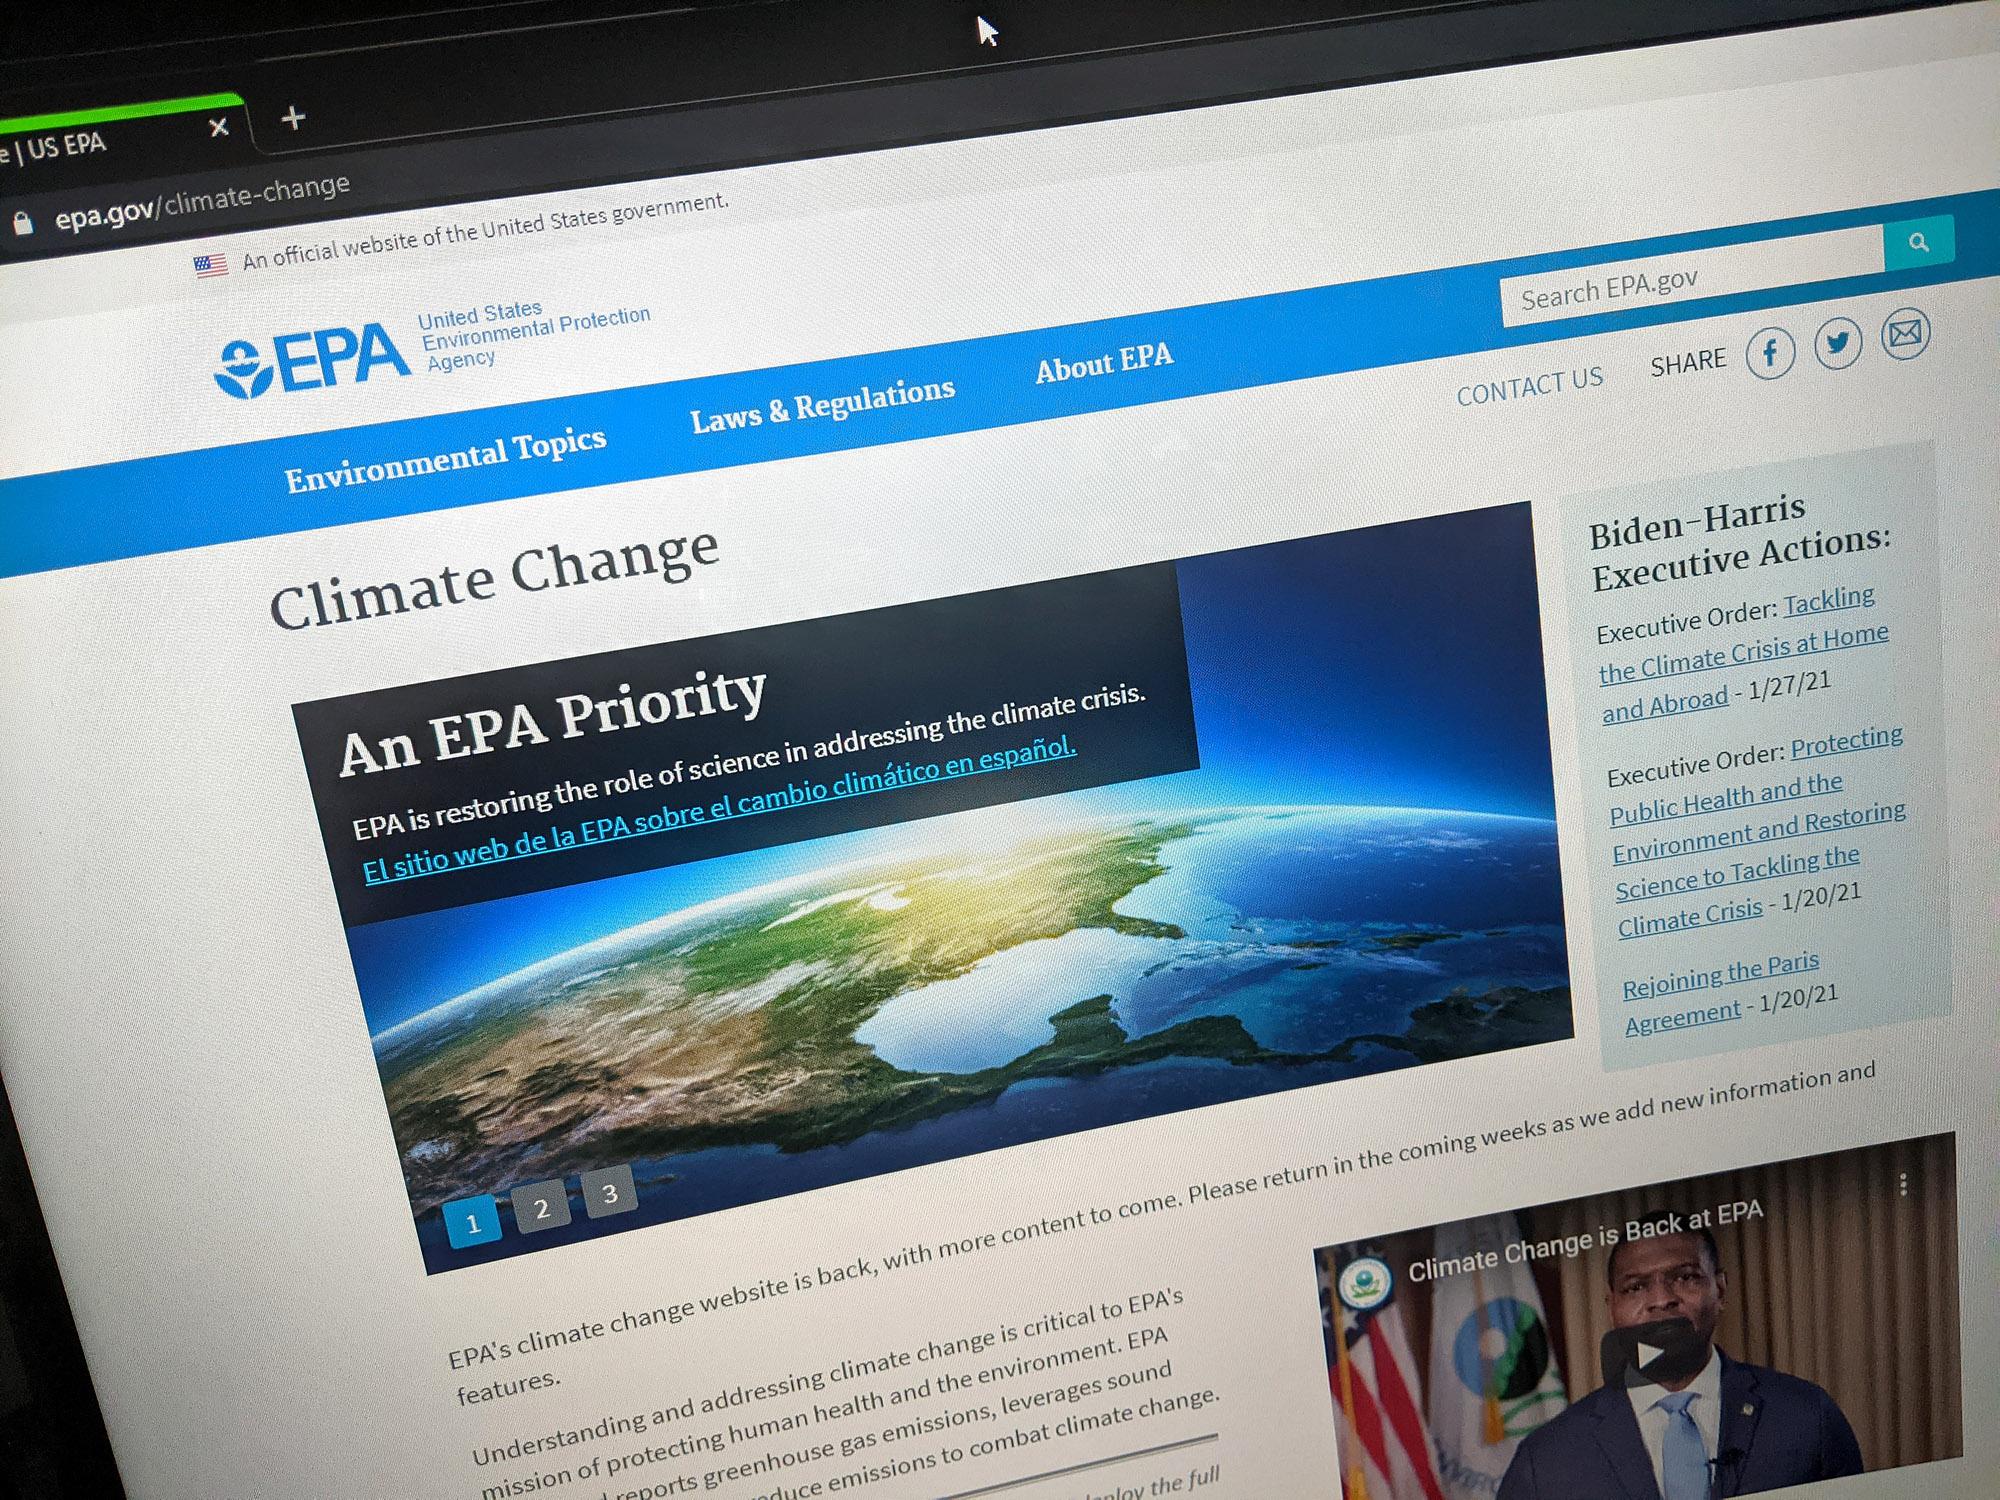 EPA.gov/climate-change website